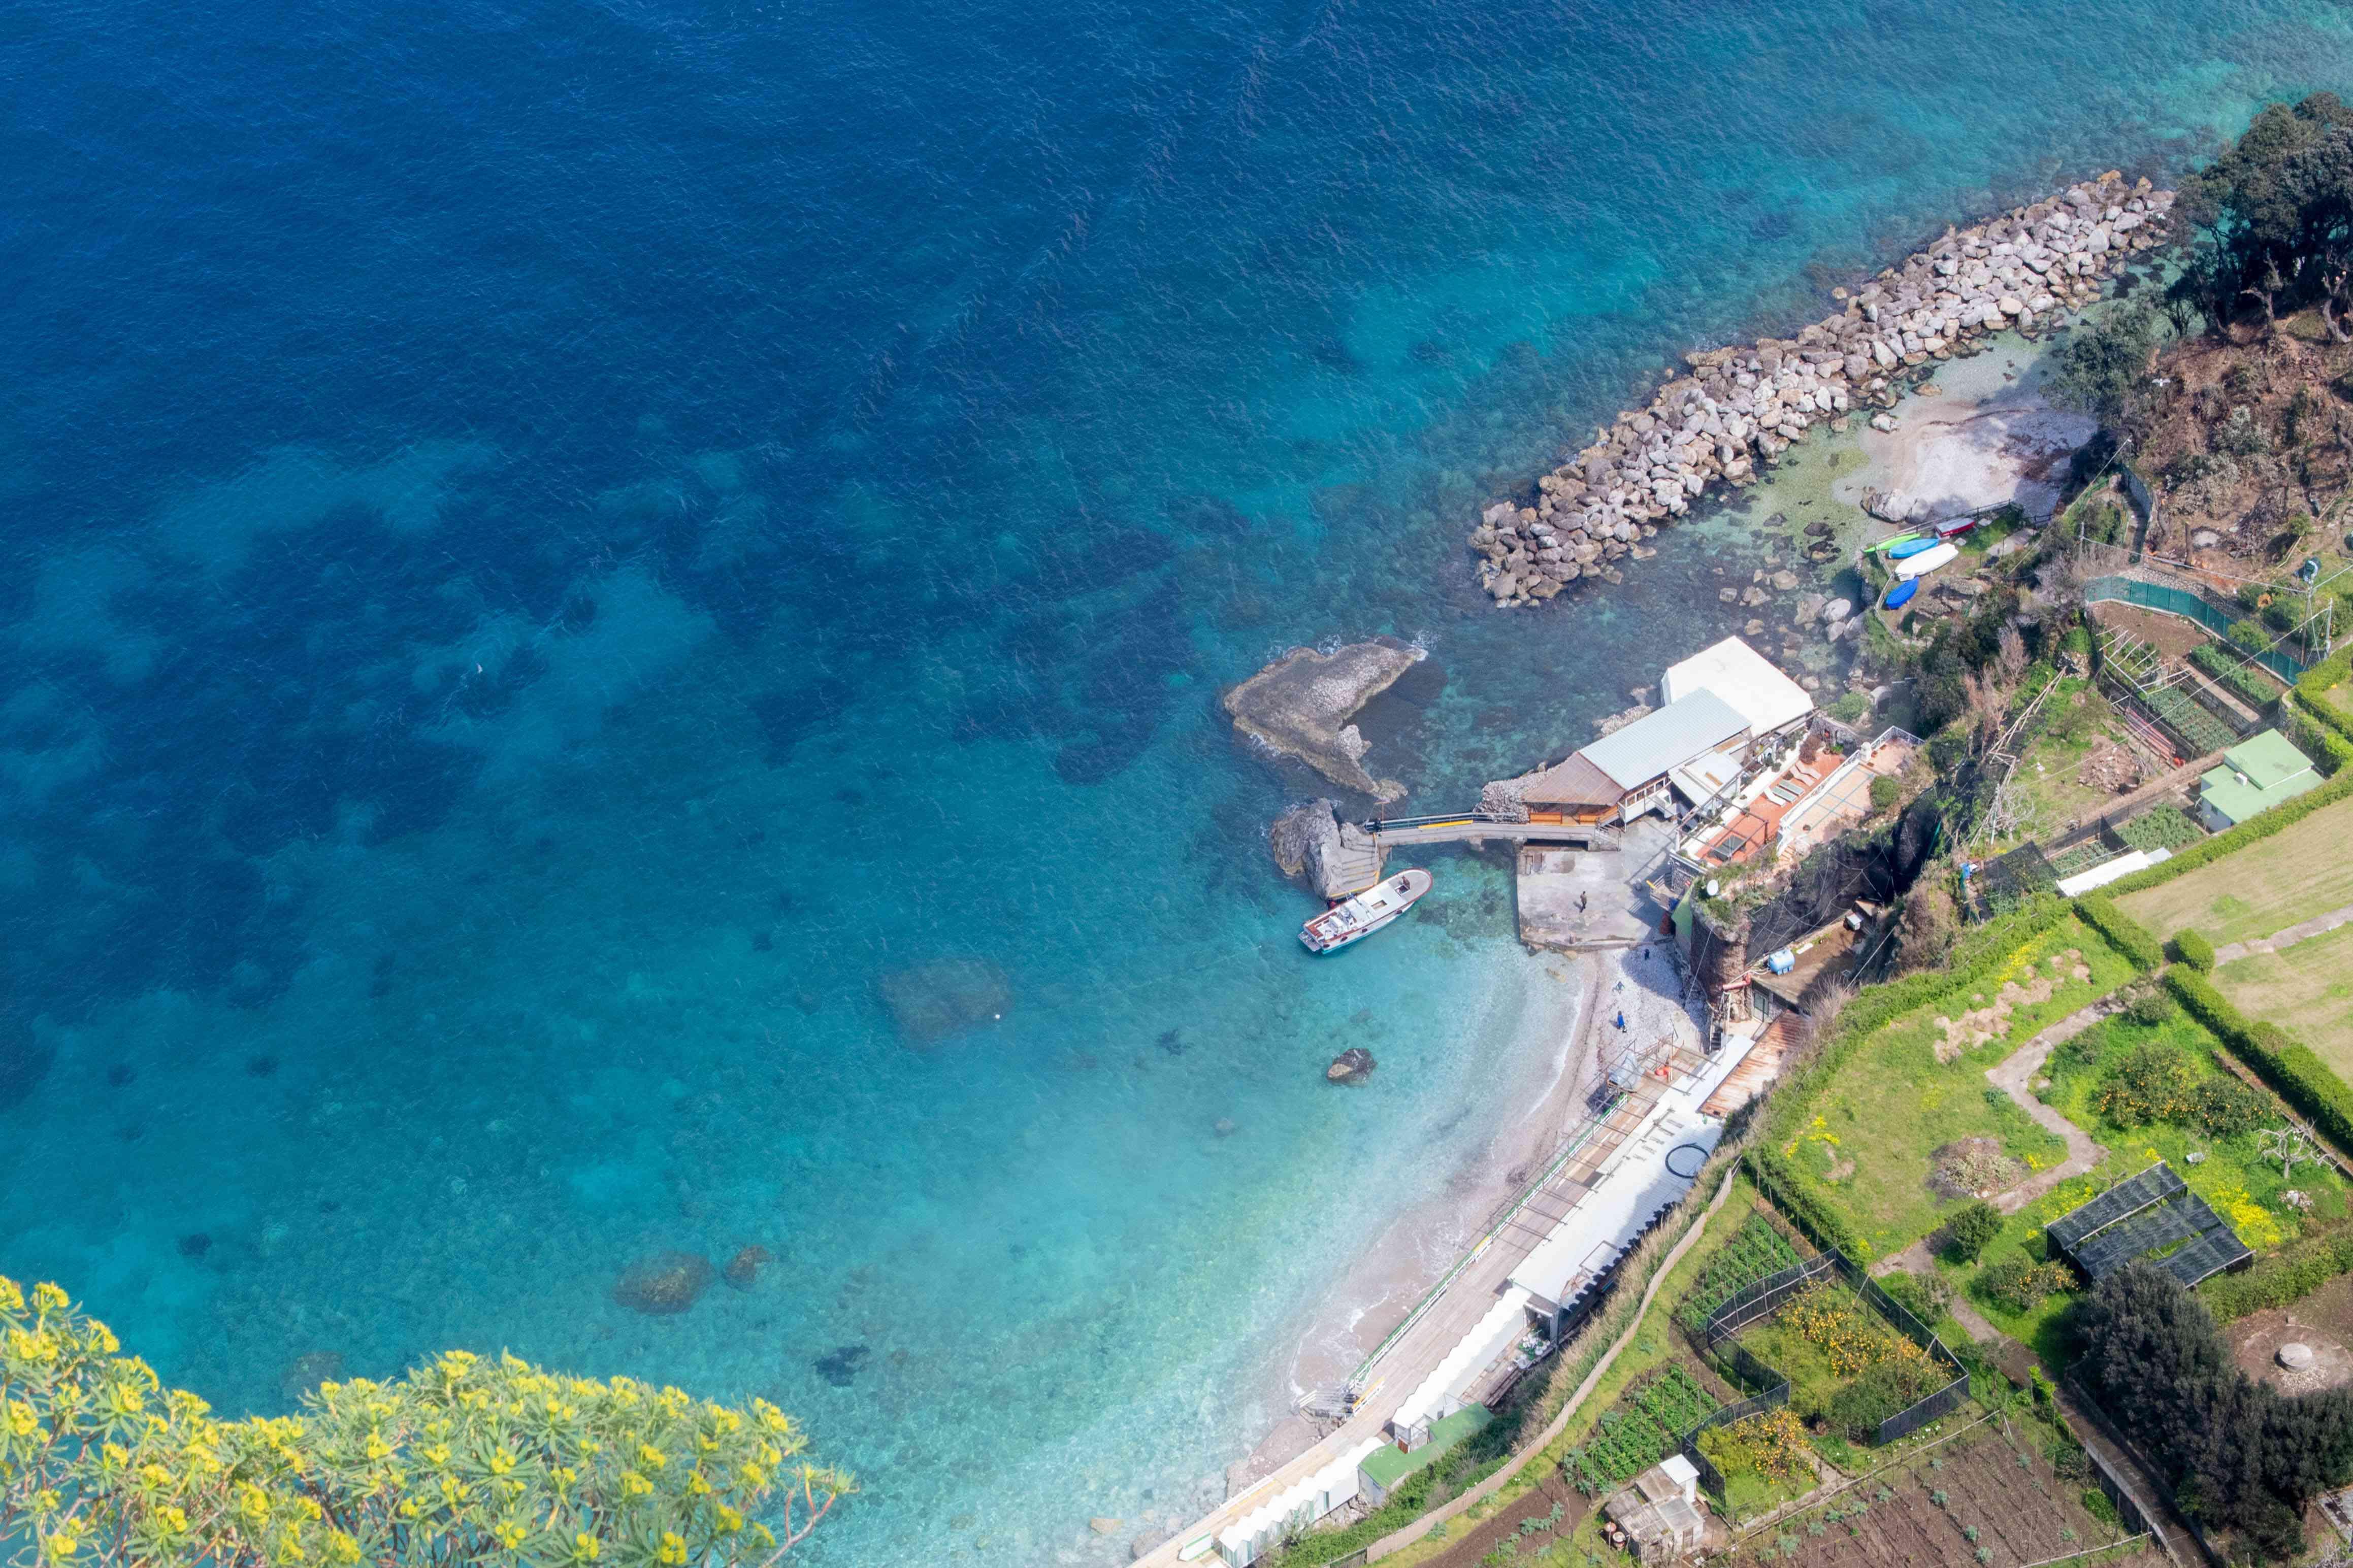 Vista general de un muelle en Capri